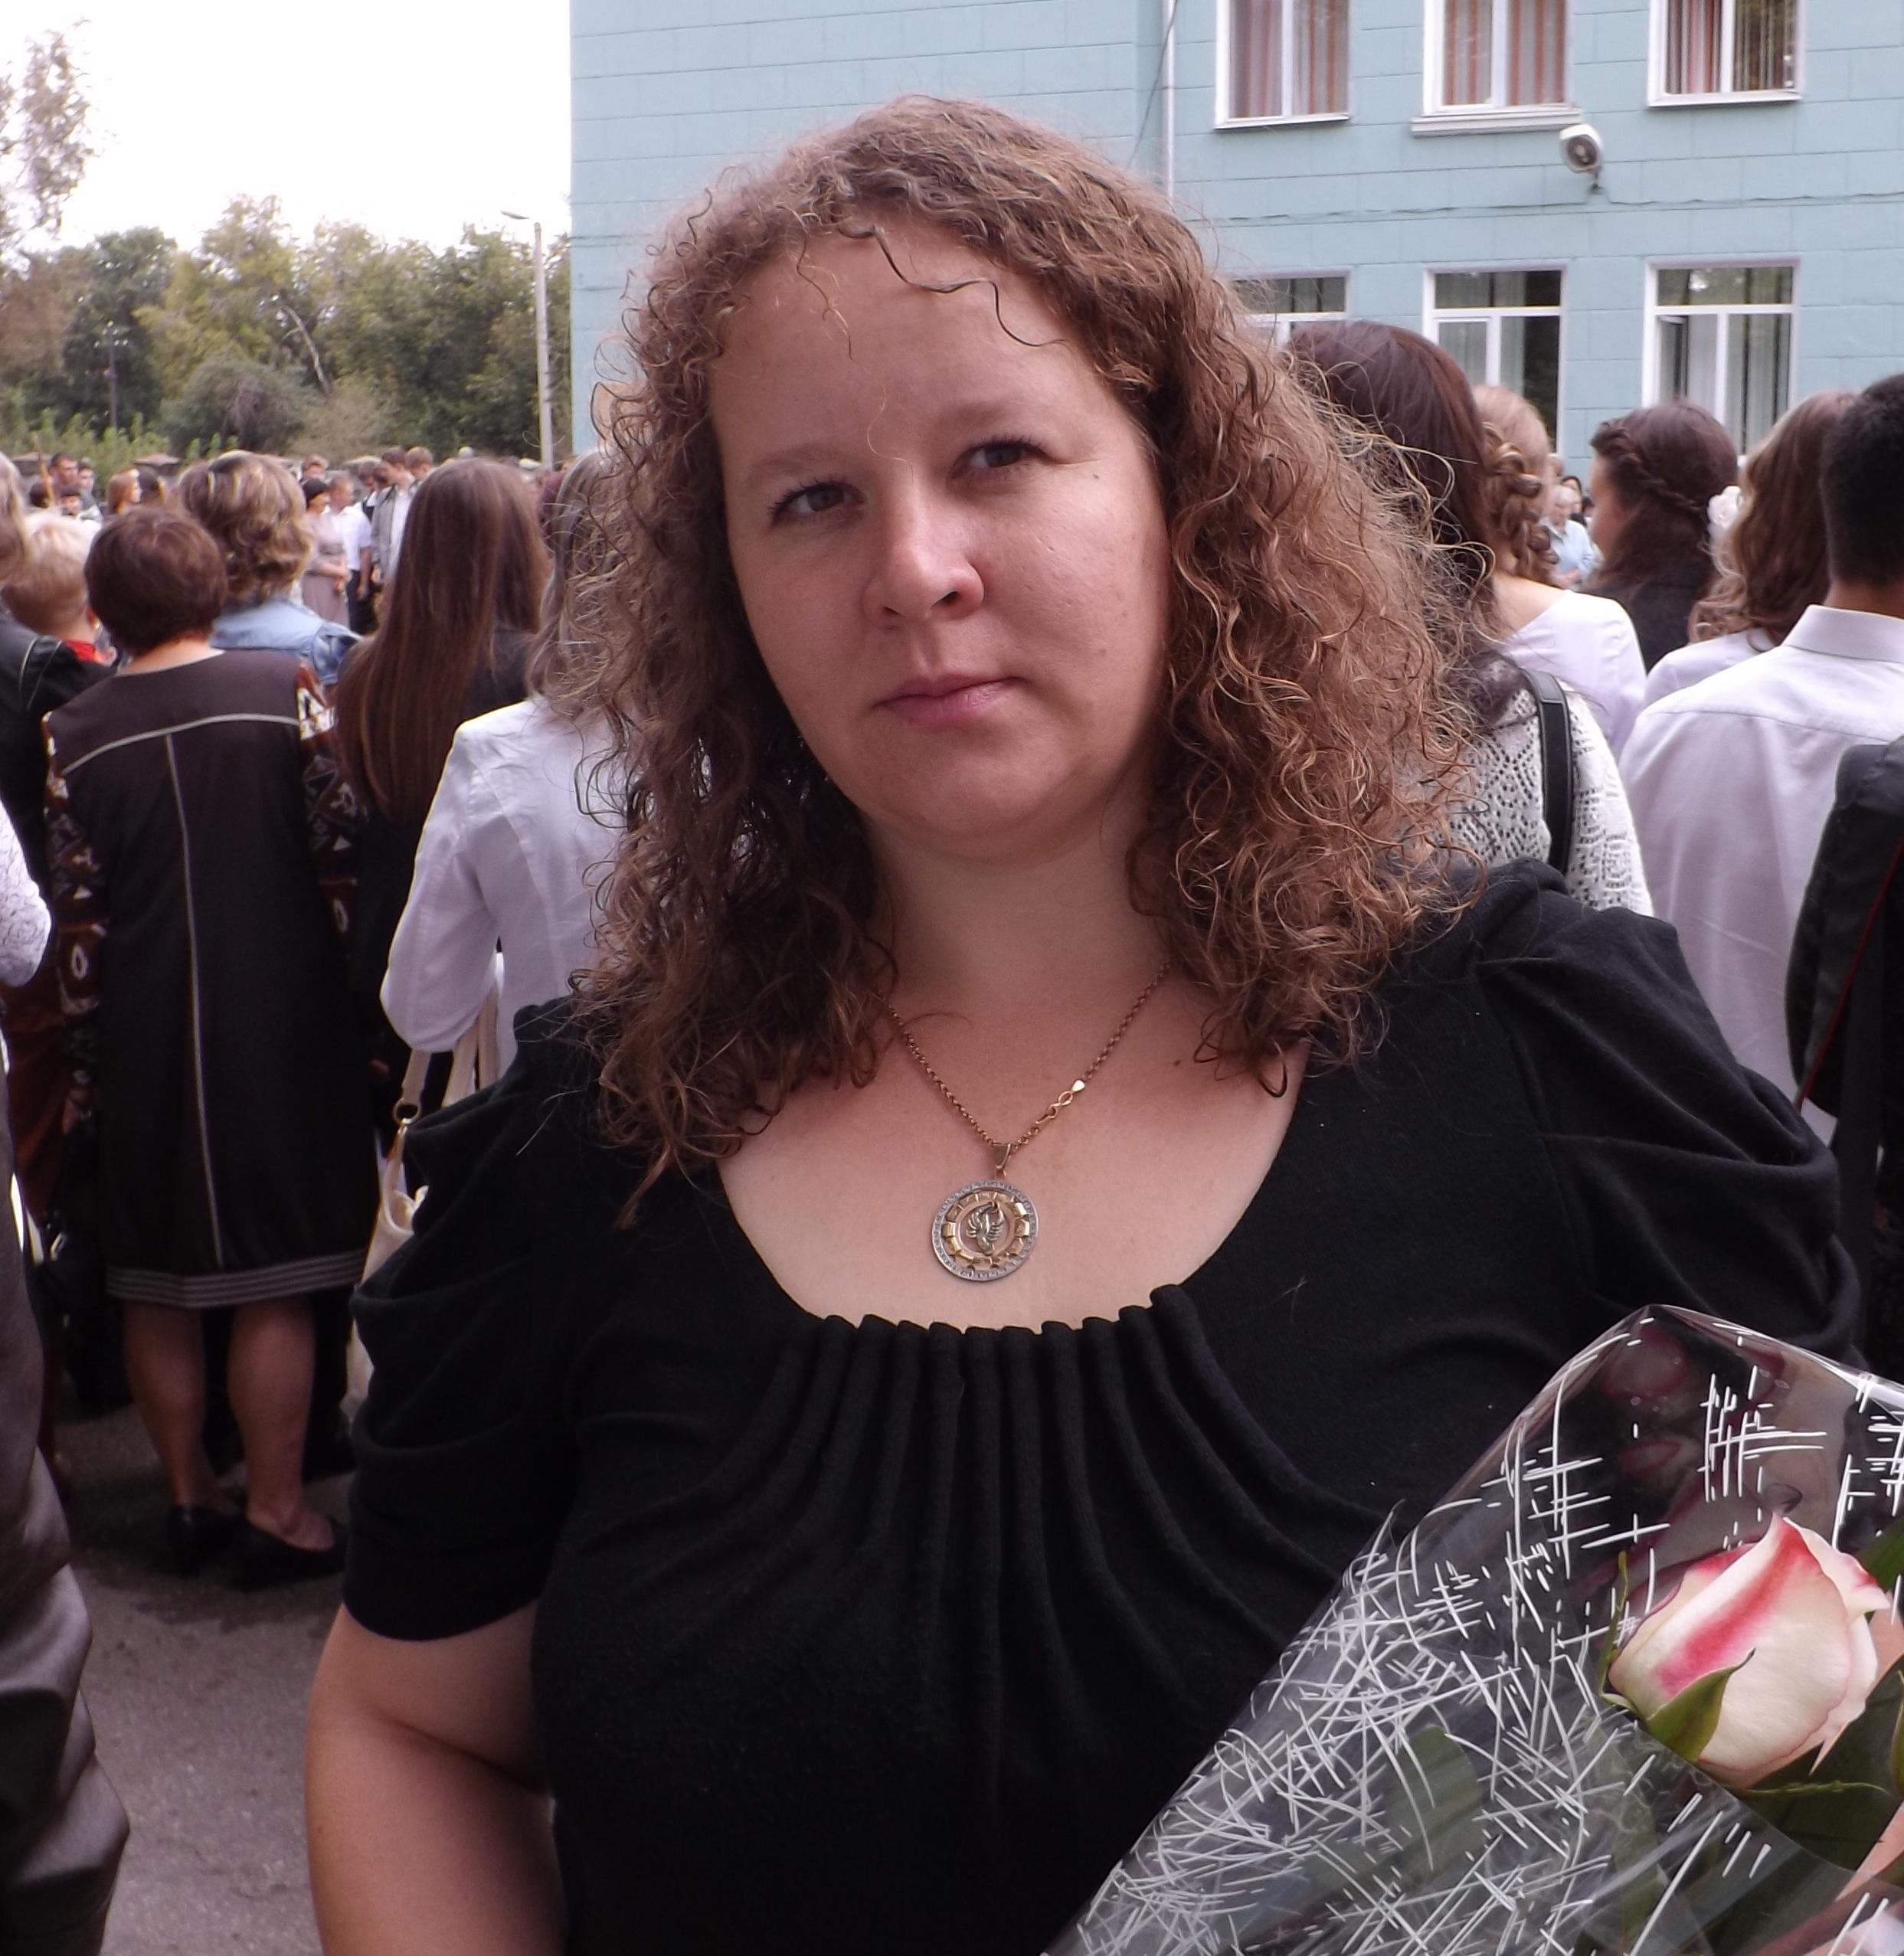 http://cdk.ucoz.ru/picteres/ghh/kopija_dscf3802.jpg